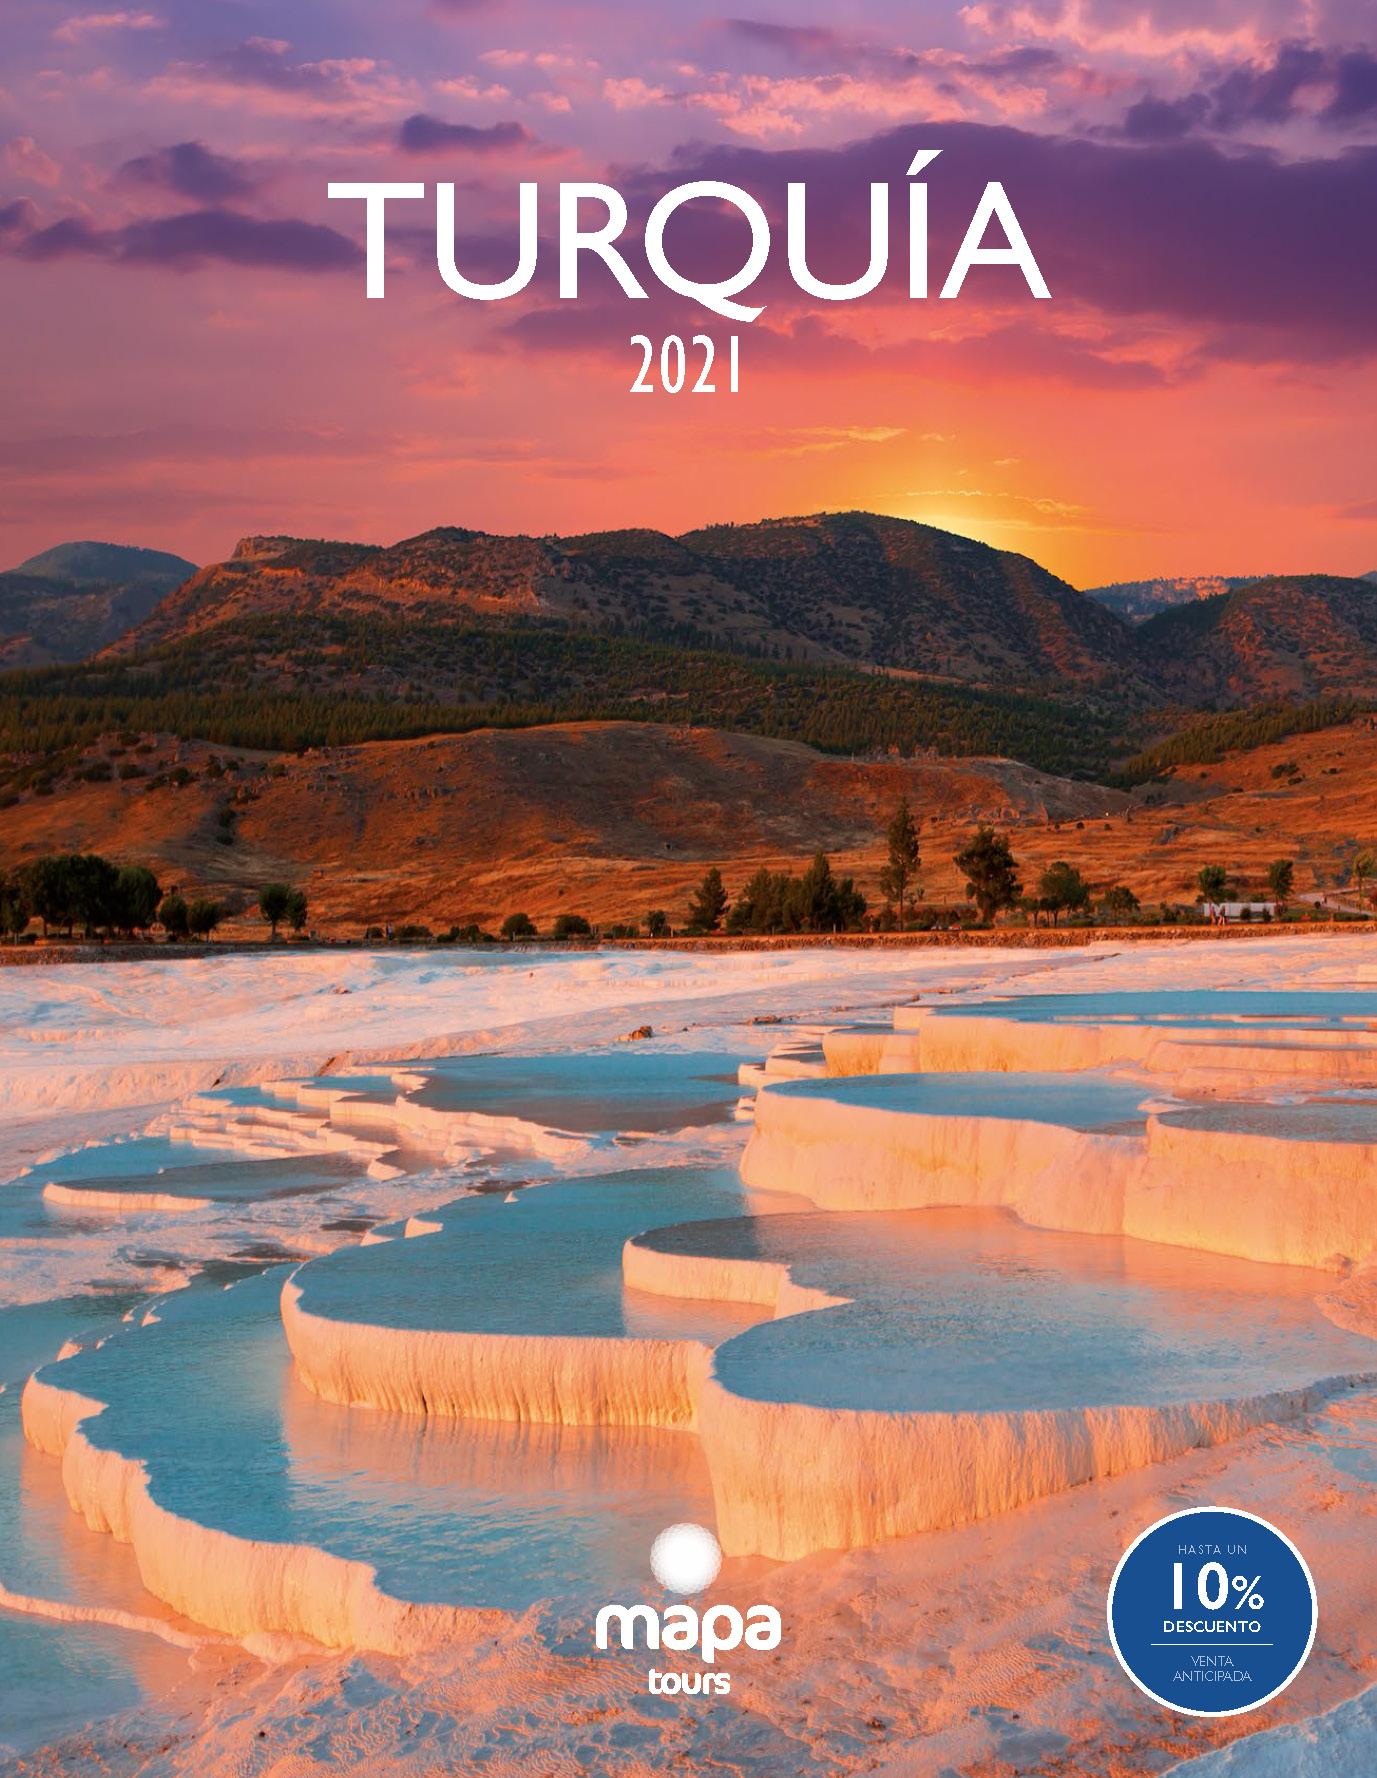 Catalogo Mapa Tours Turquia 2021